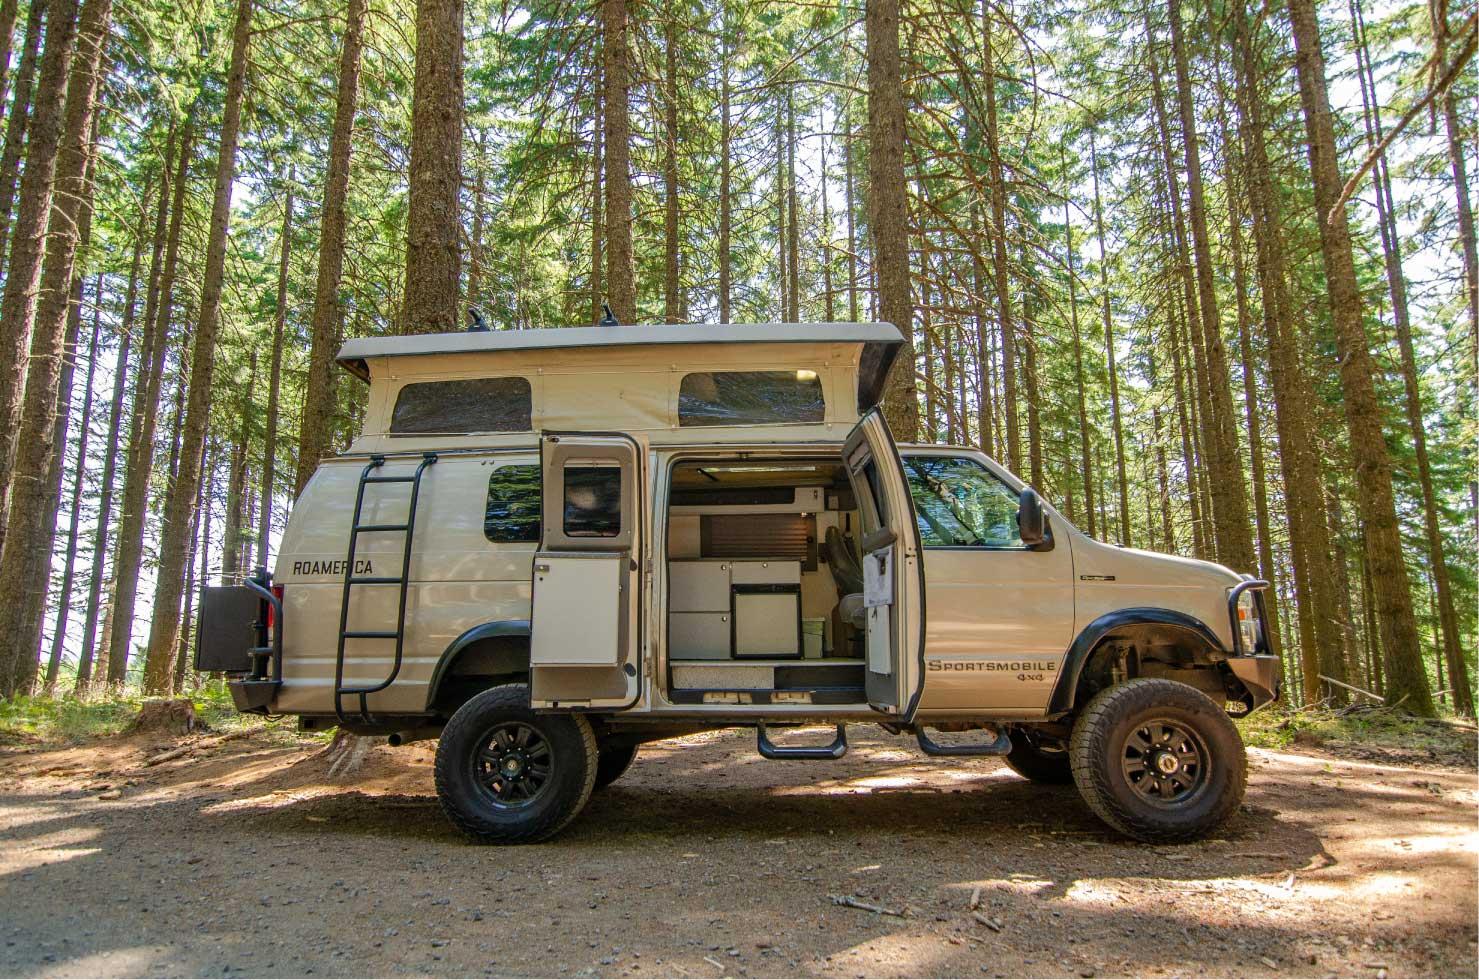 Ford E-Series 4x4 Econoline Sportsmobile EB50 Layout Campervan conversion for sale